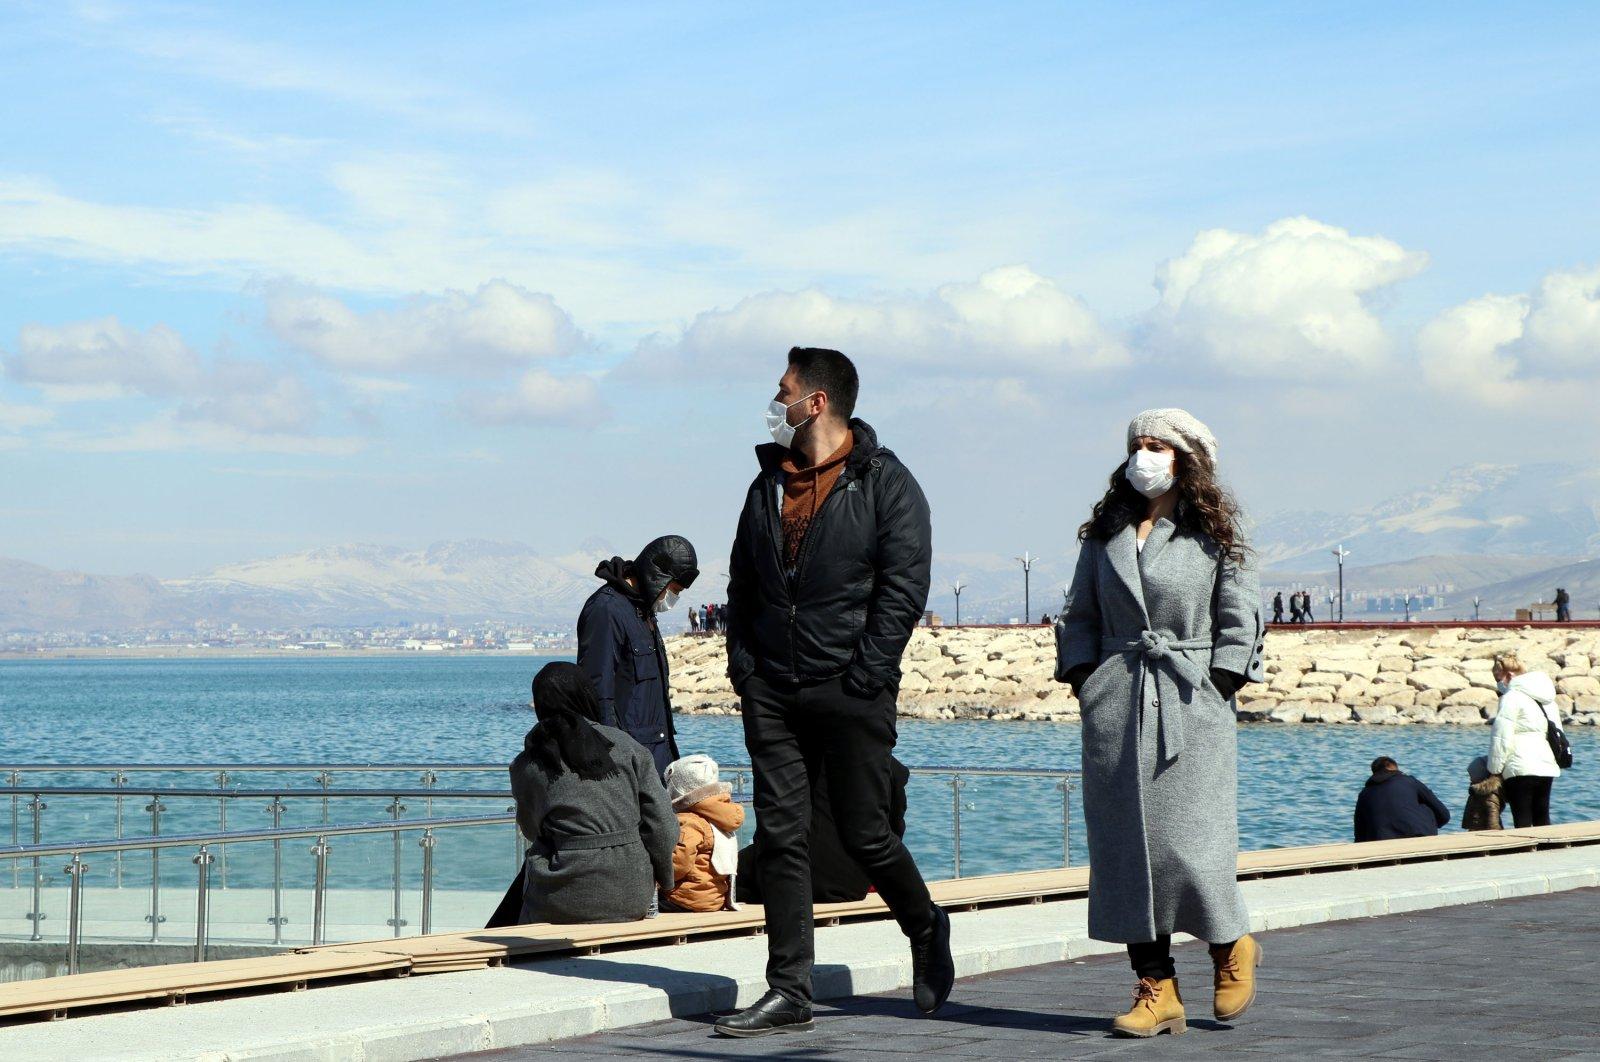 People wearing protective masks walk on the shore of Lake Van, in Van, eastern Turkey, March 14, 2021. (DHA PHOTO)